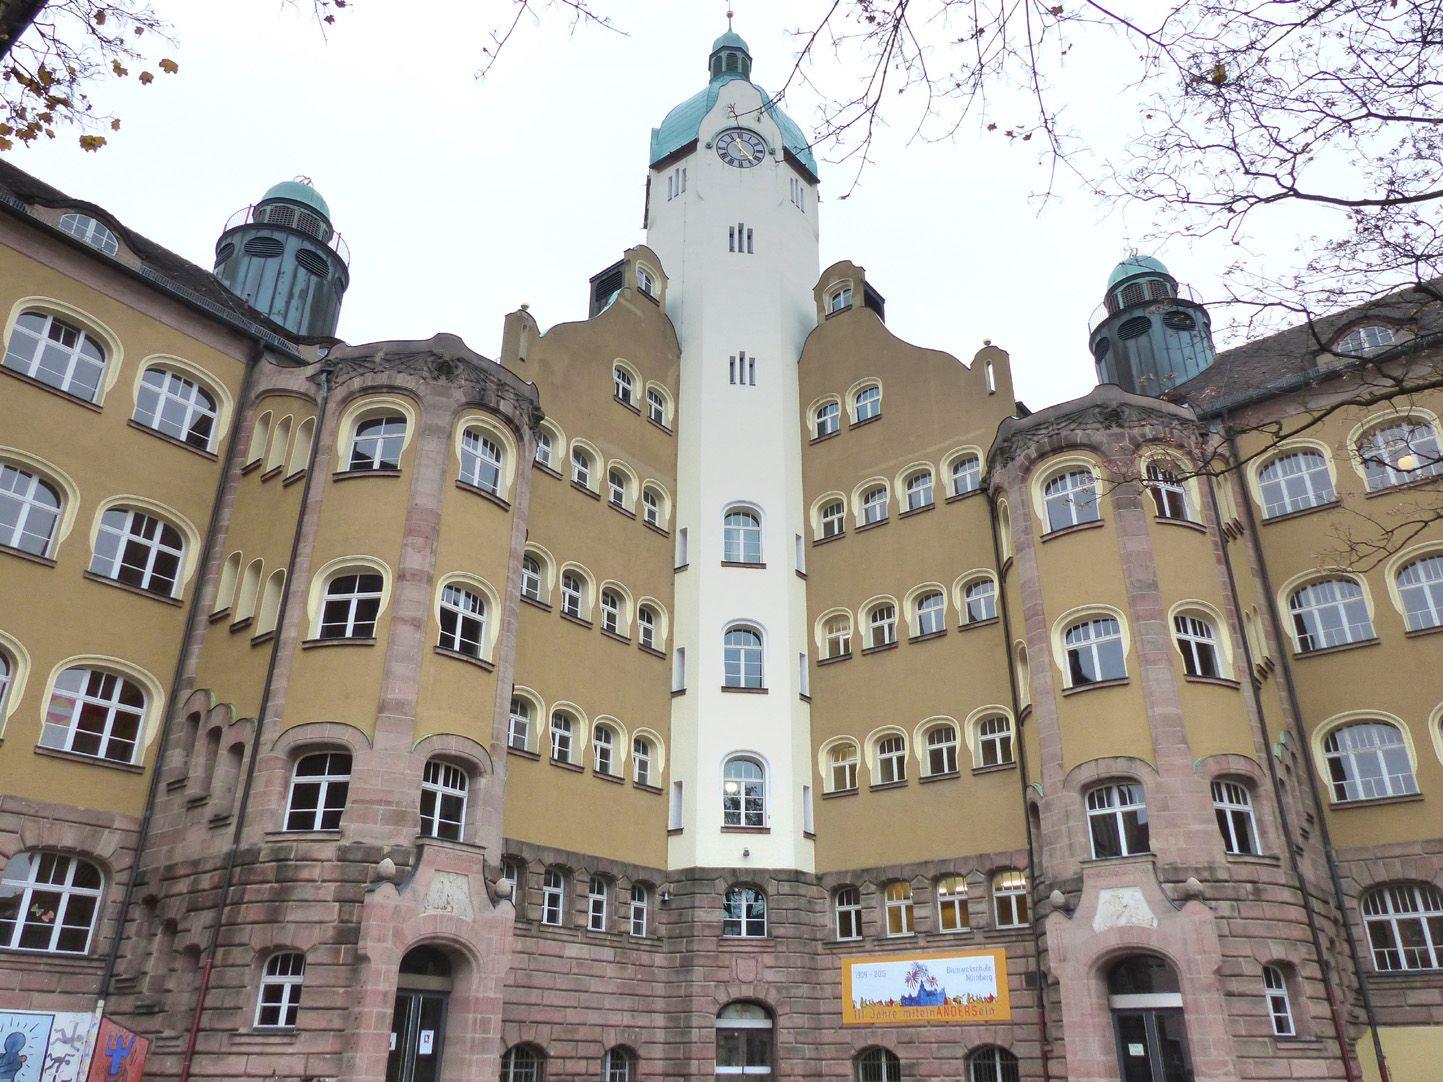 Bismarck-School Schoolyard with stairwell towers